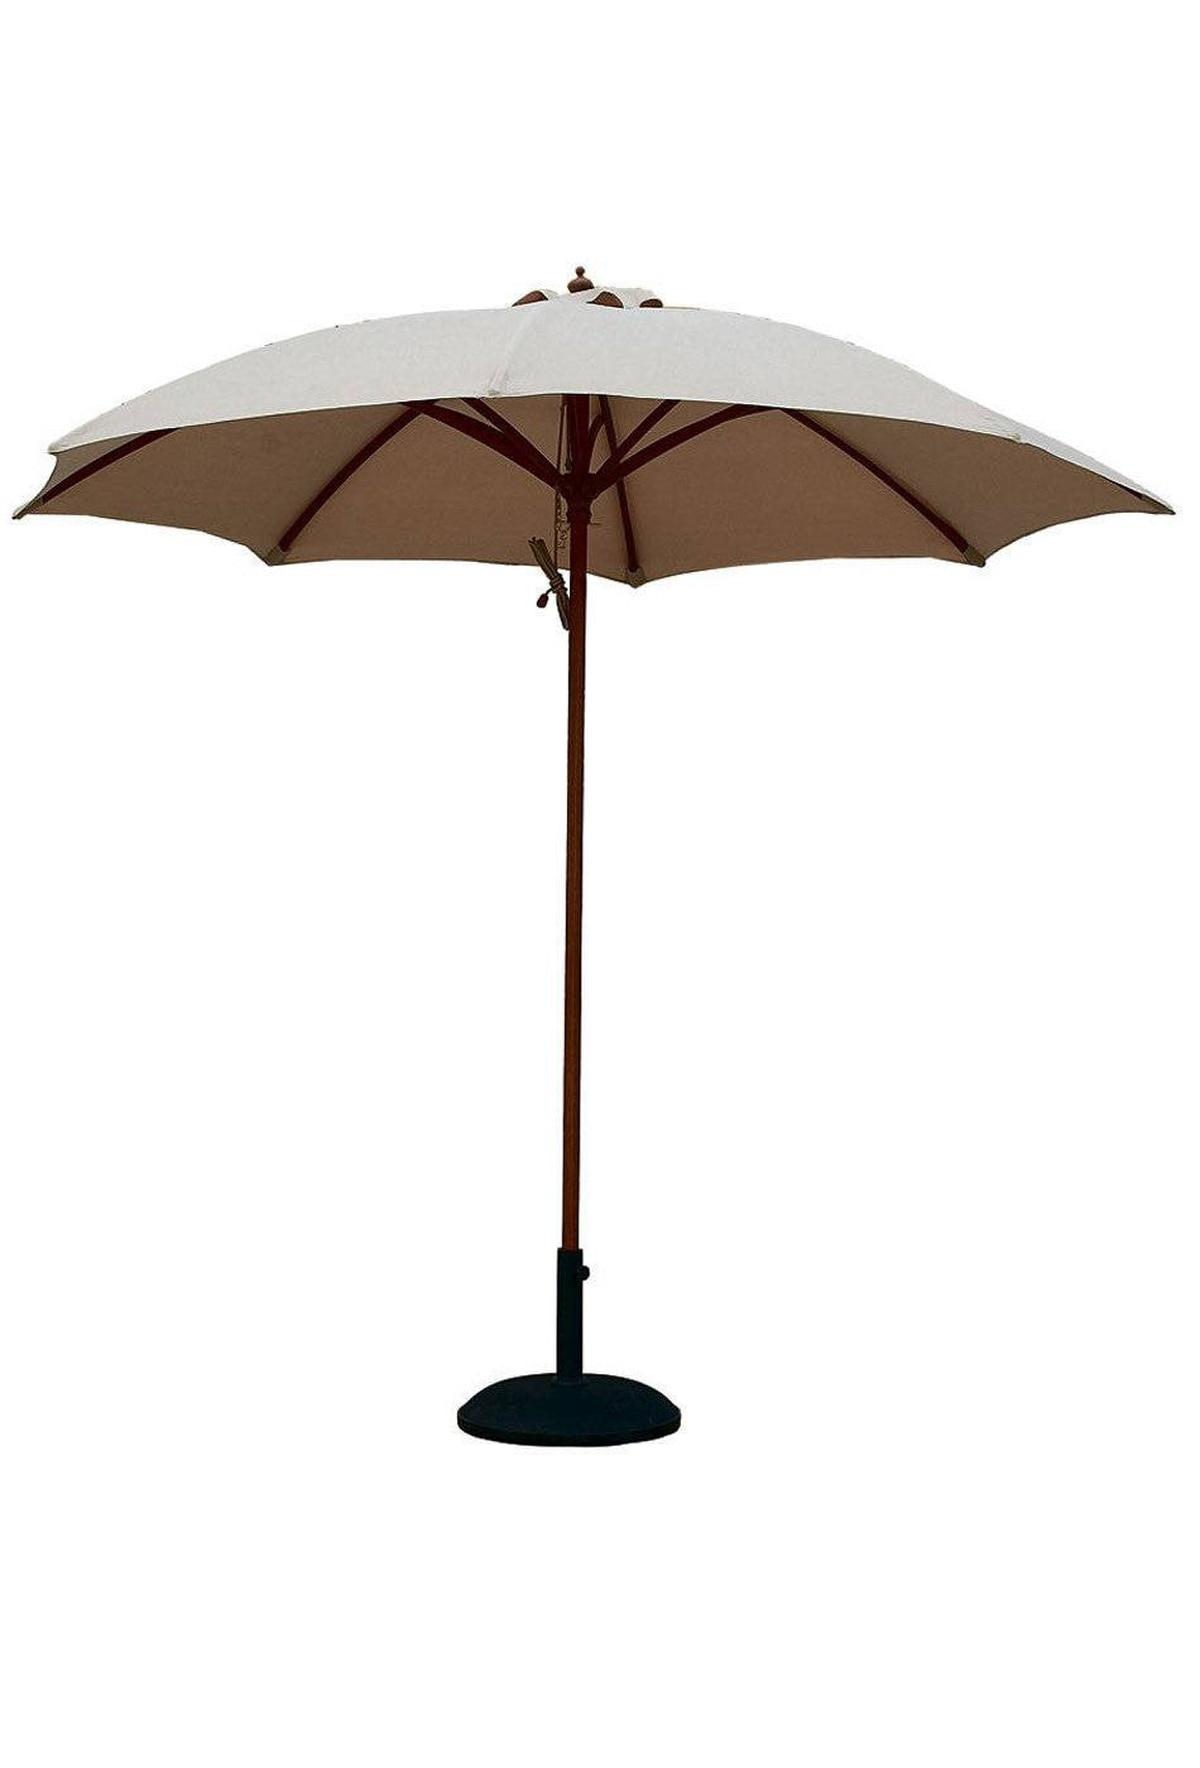 Vancouver Umbrella's nine-foot-wide Rain market umbrella is UV-coated, rain-resistant and features a sustainable Indonesian hardwood pole. $400 through www.vancouverumbrella.com.